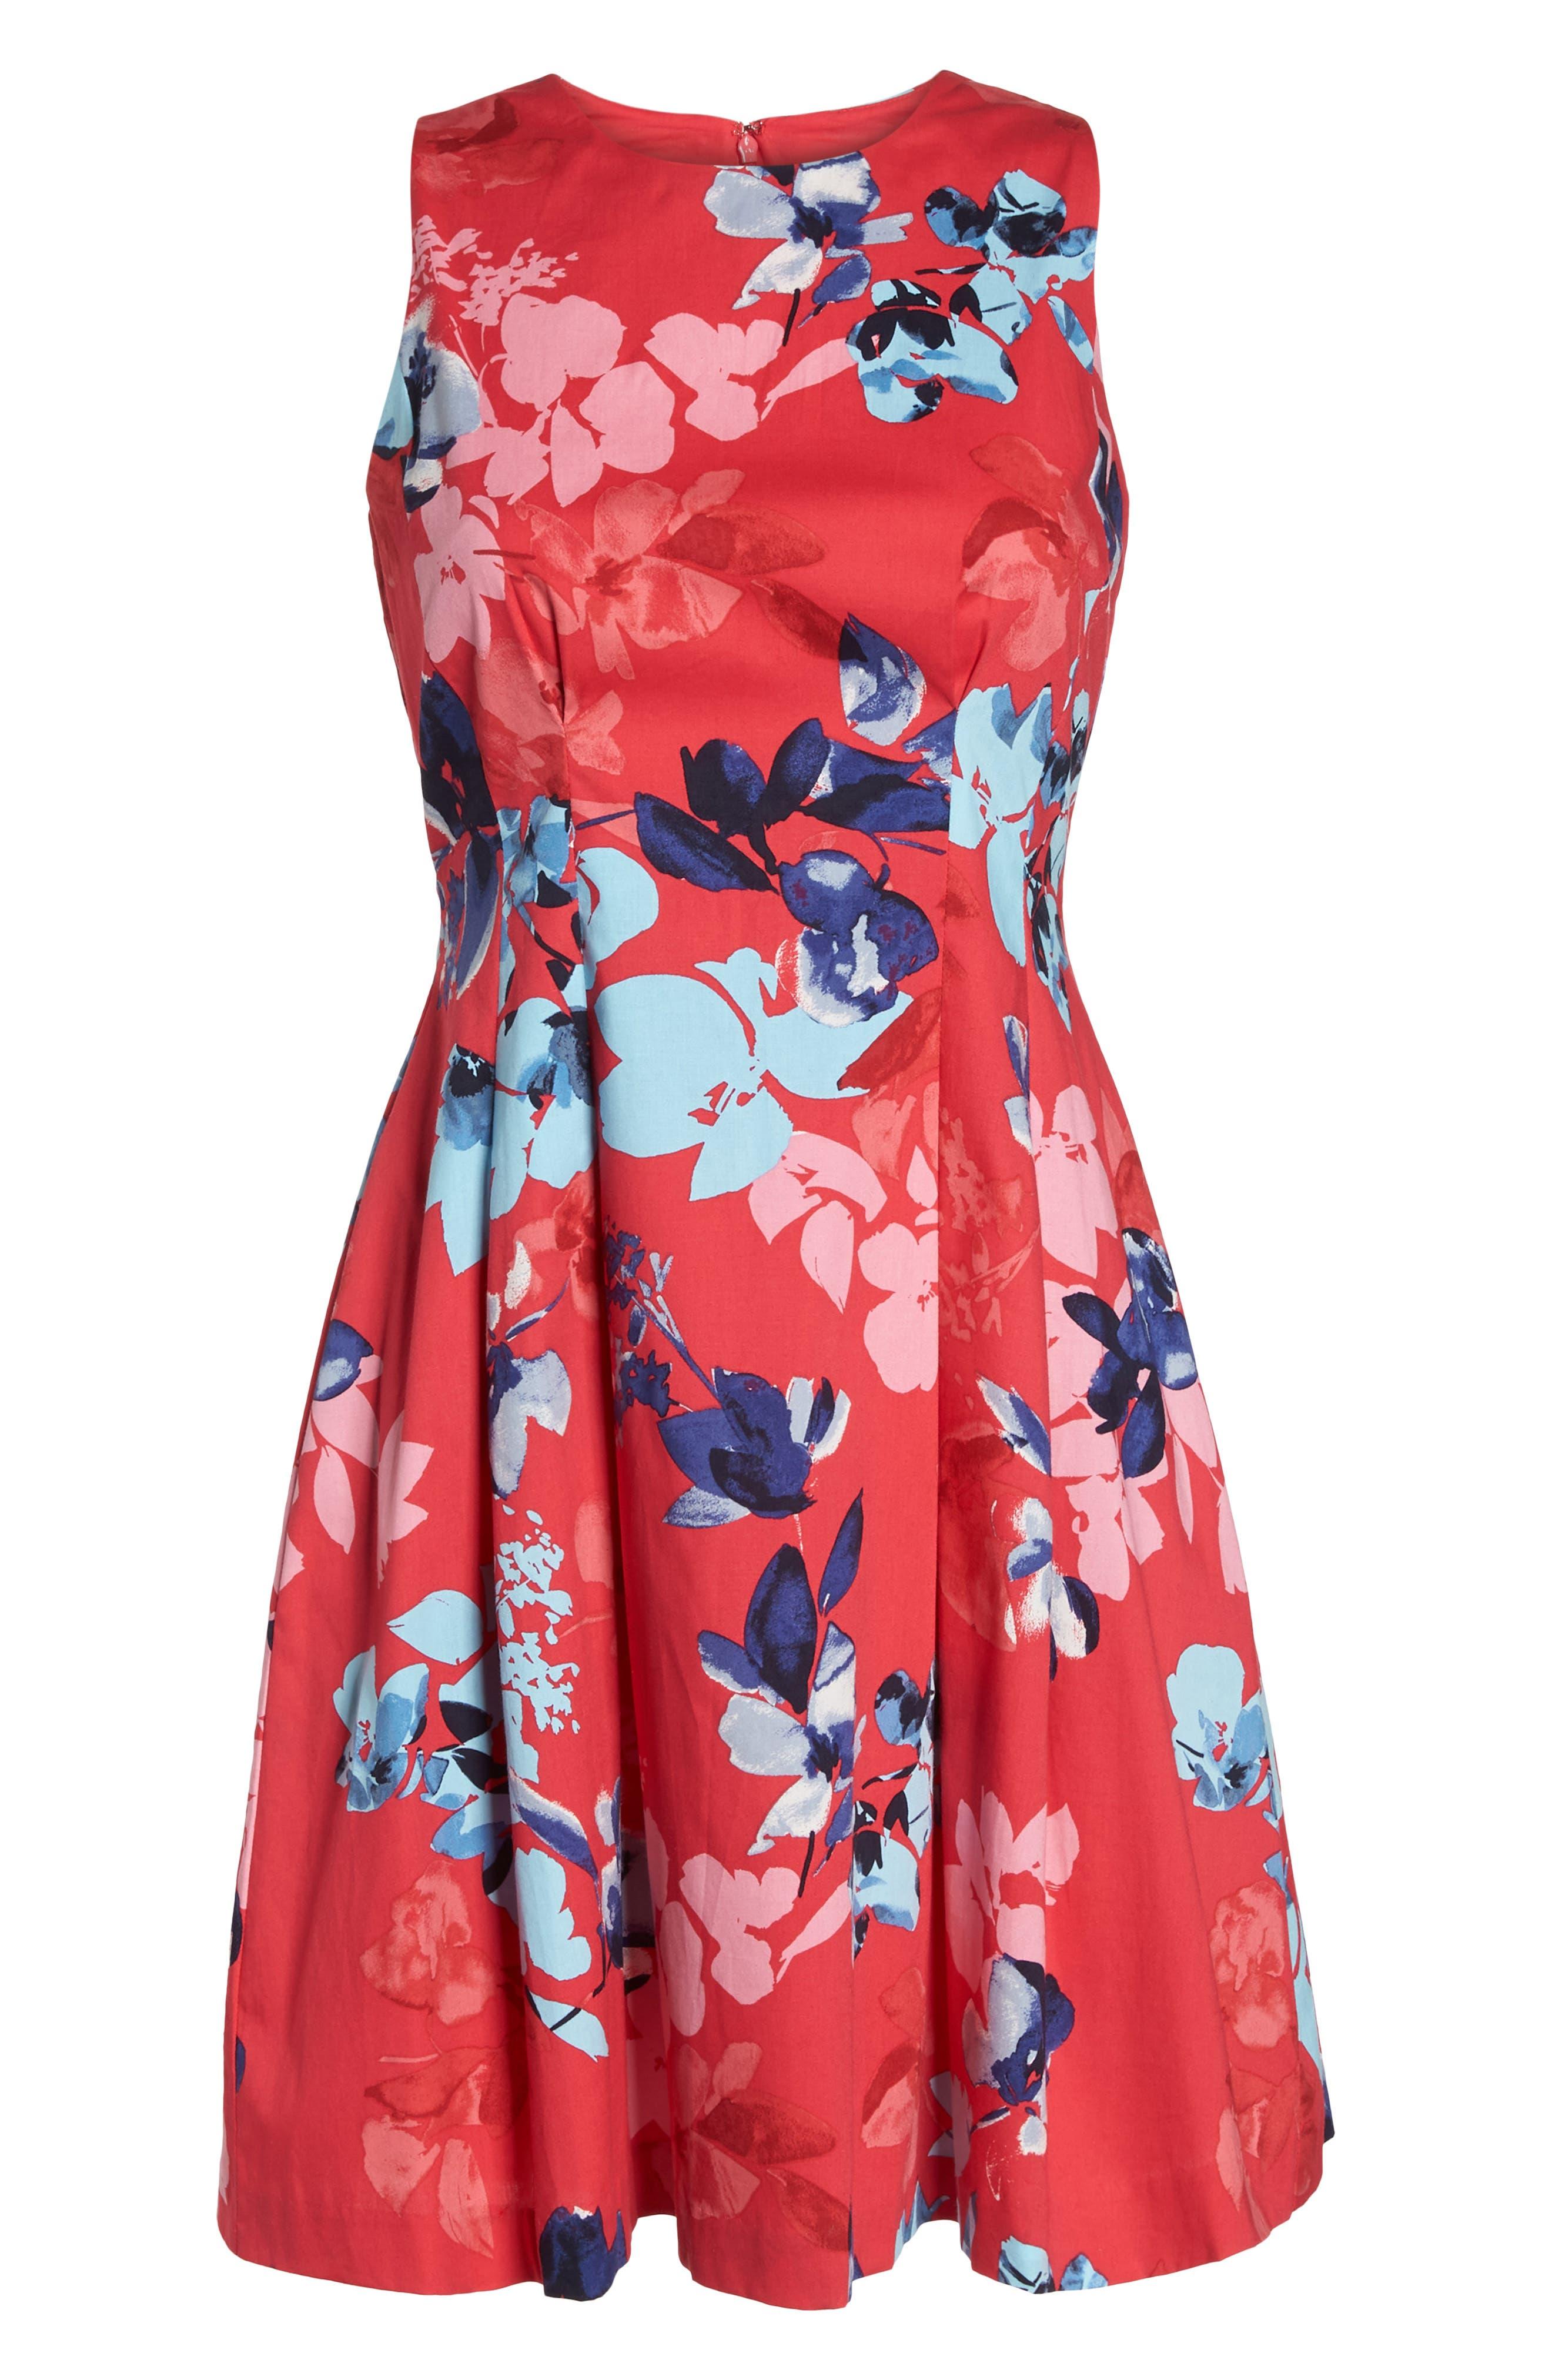 VINCE CAMUTO,                             Floral Cotton Fit & Flare Dress,                             Alternate thumbnail 7, color,                             653